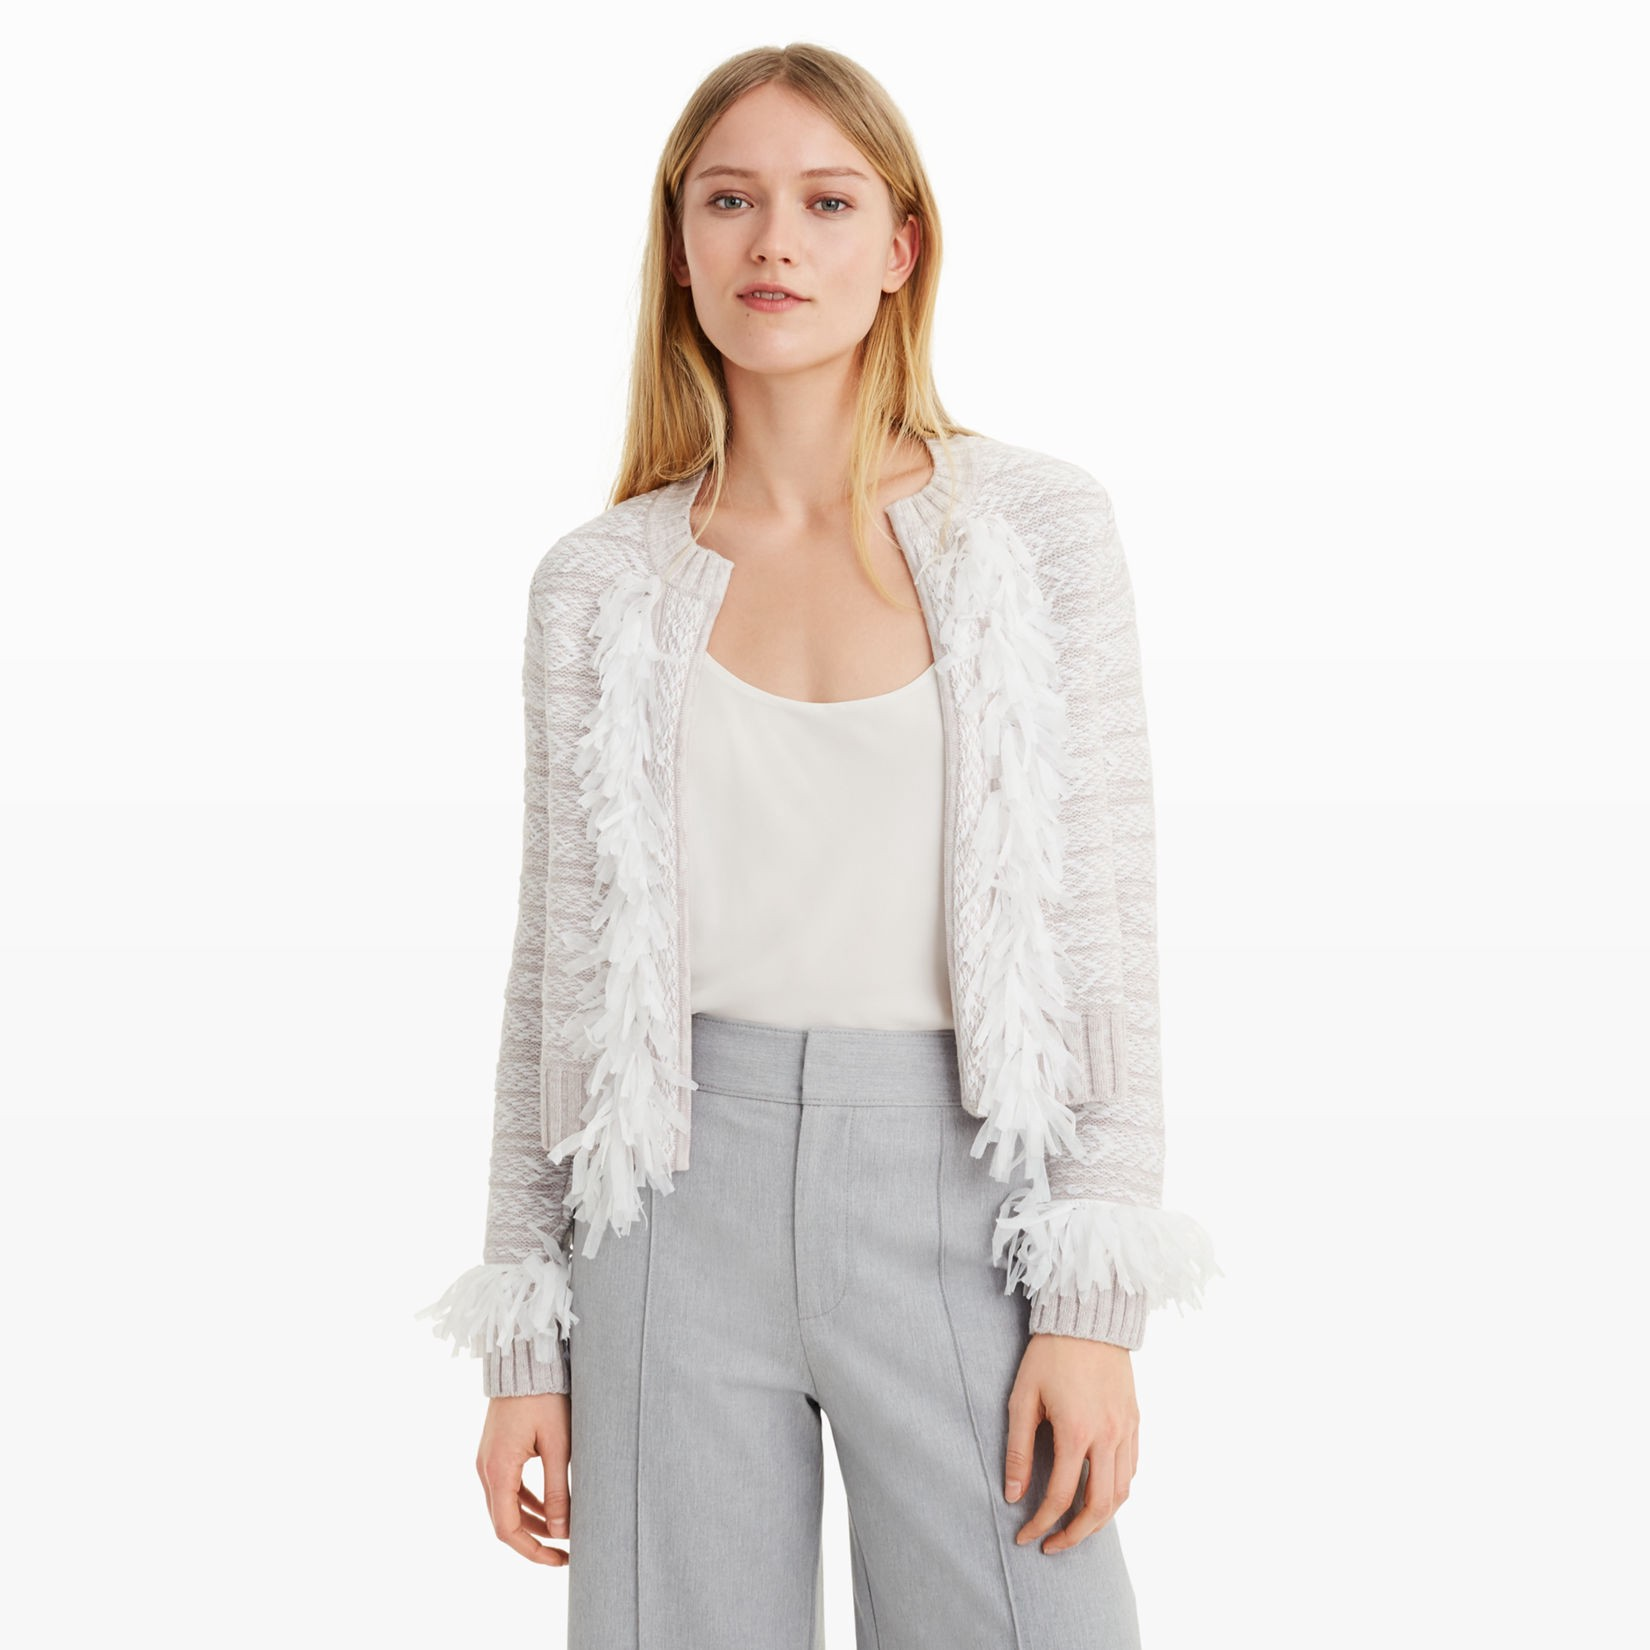 CLUB MONACO Mahssa Sweater Jacket in Spring Blossom